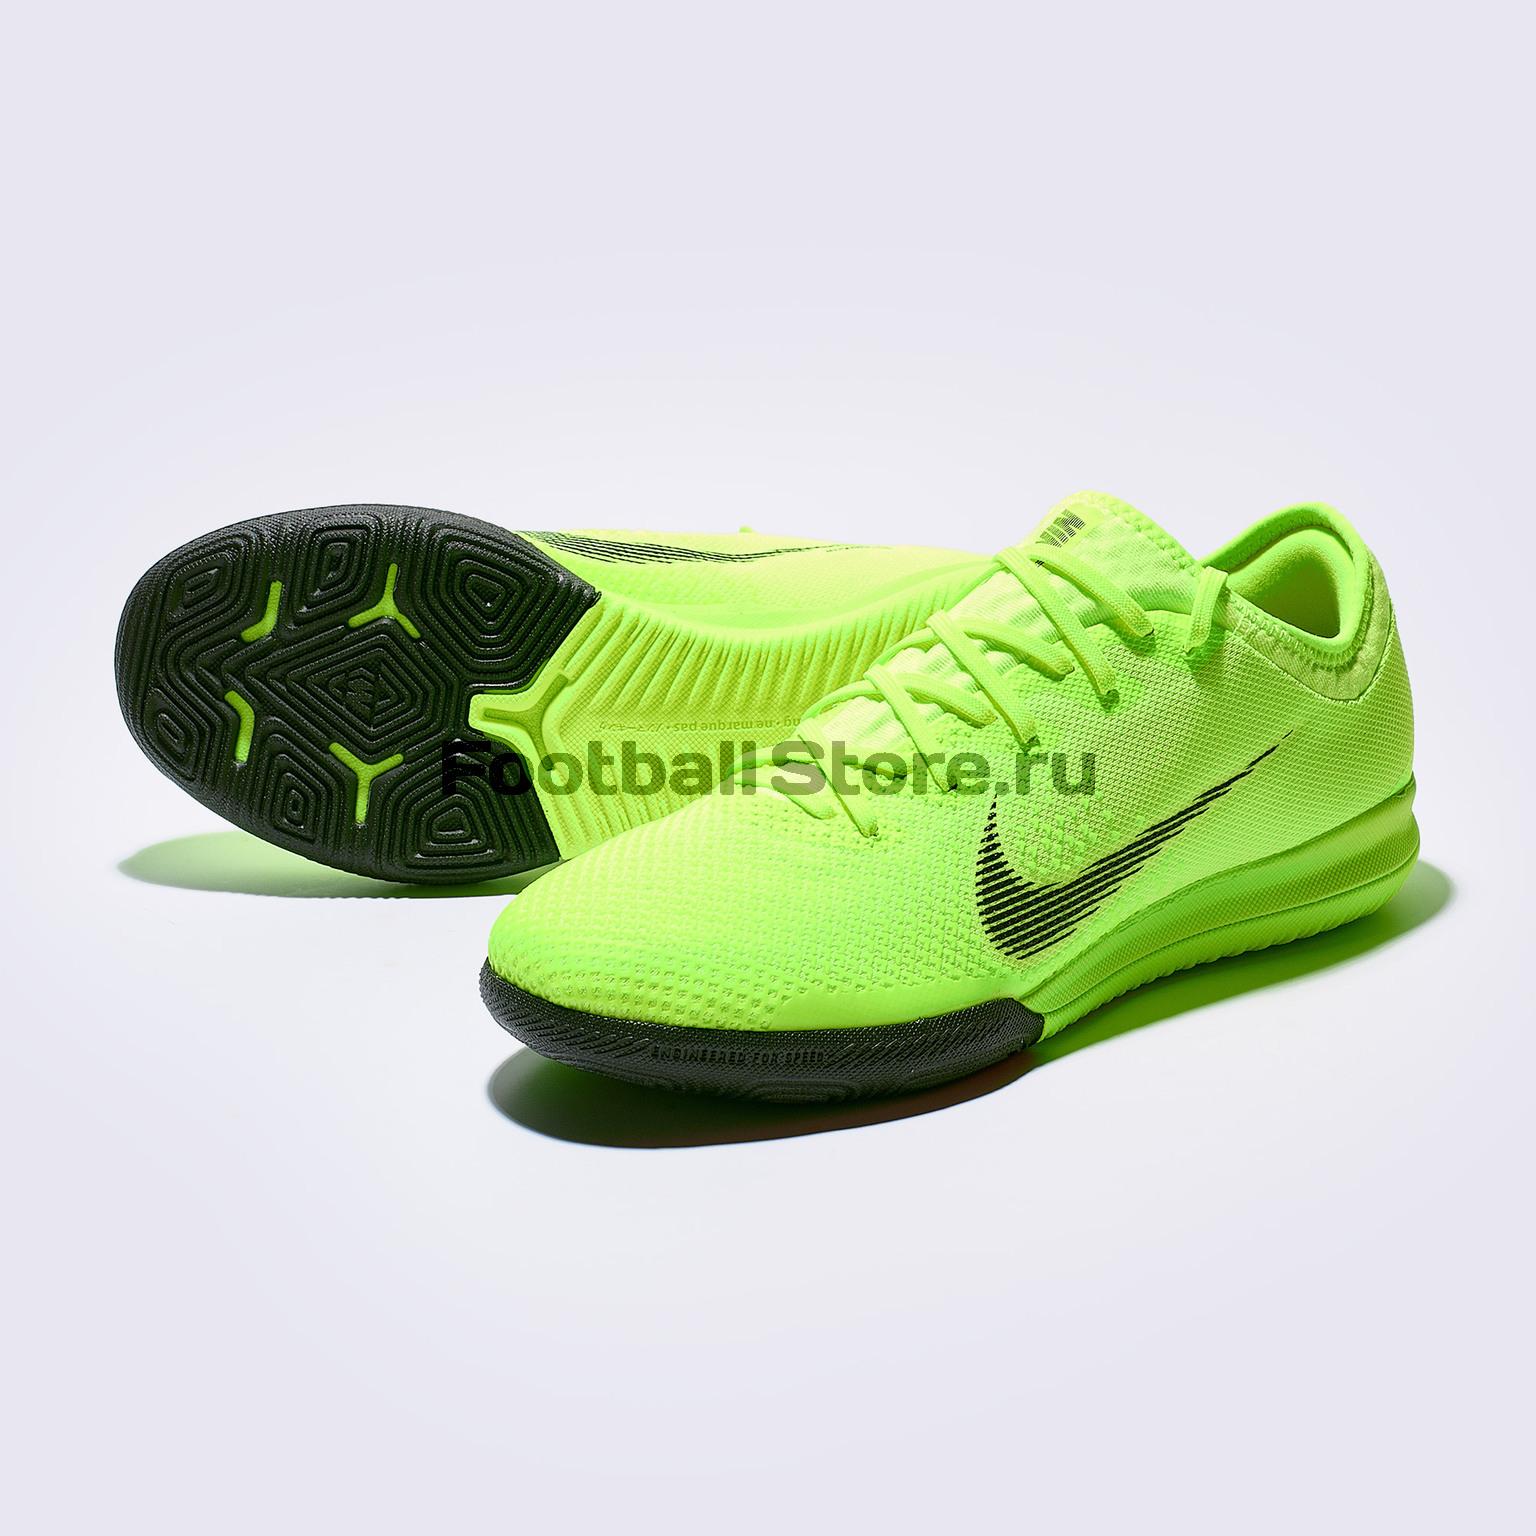 0edcadc6 Футзалки Nike VaporX 12 Pro IC AH7387-701 – купить футзалки в ...